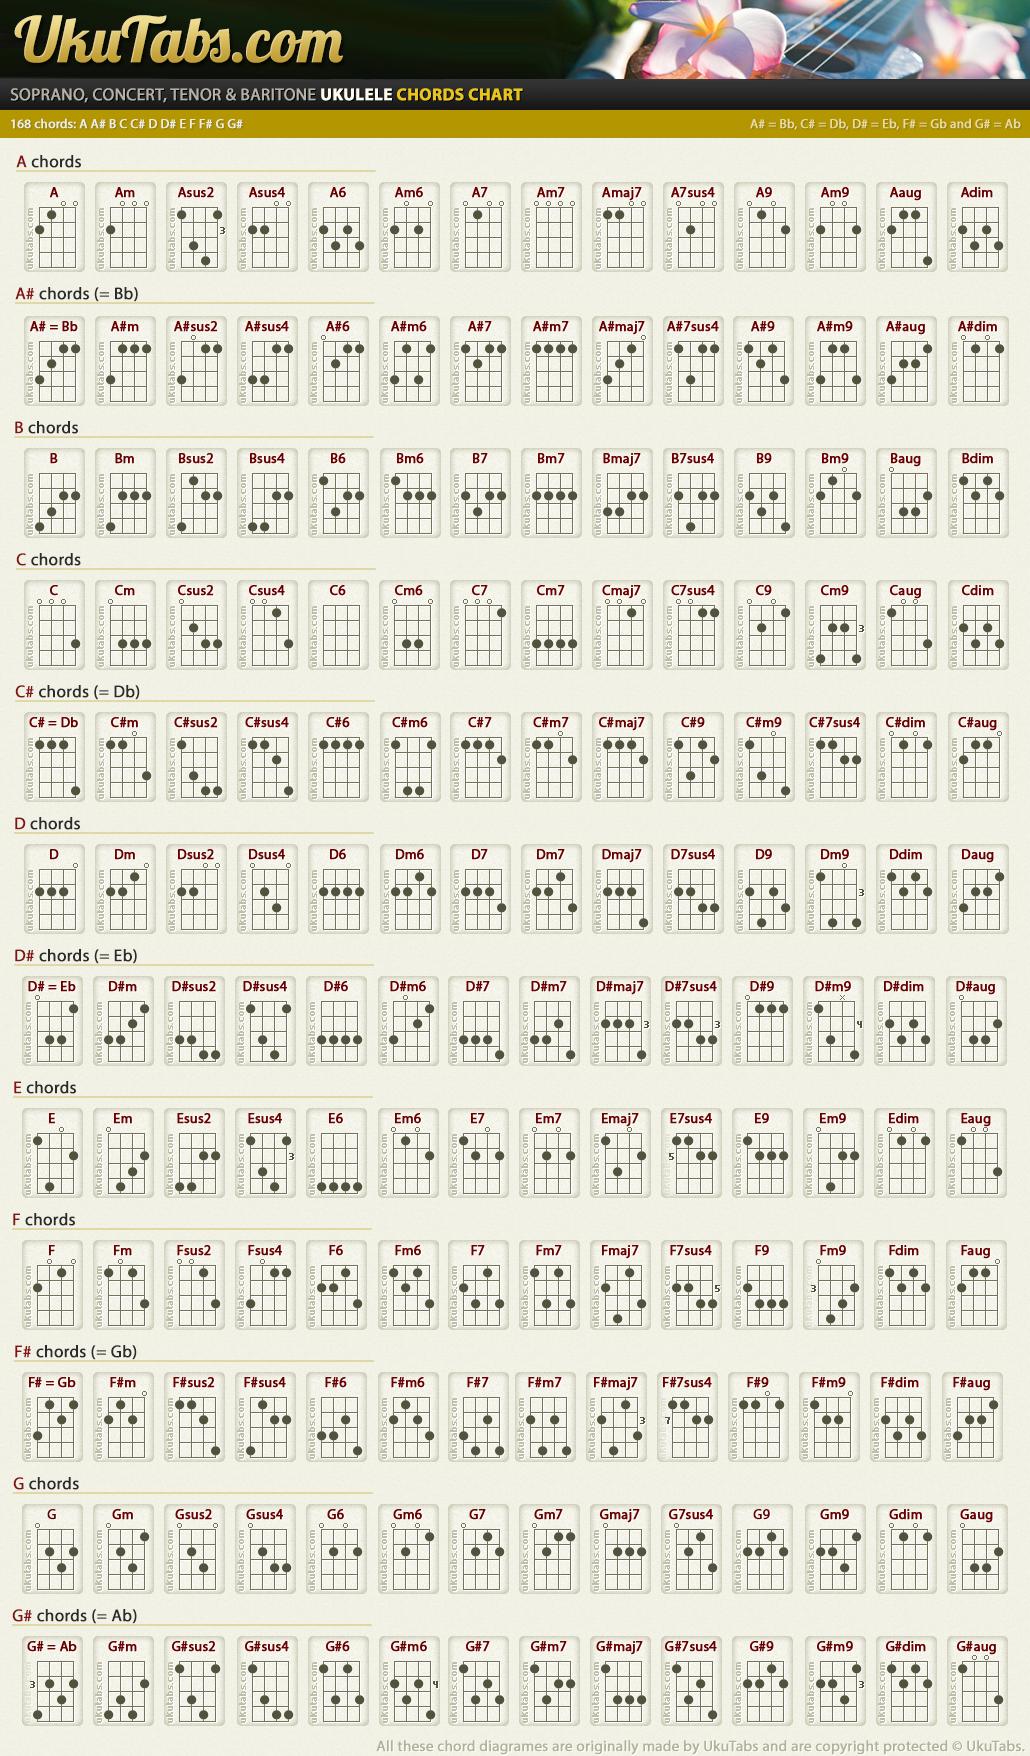 Ukutabs complete chords chartg 10301756 for my man ukulele tabs hexwebz Gallery